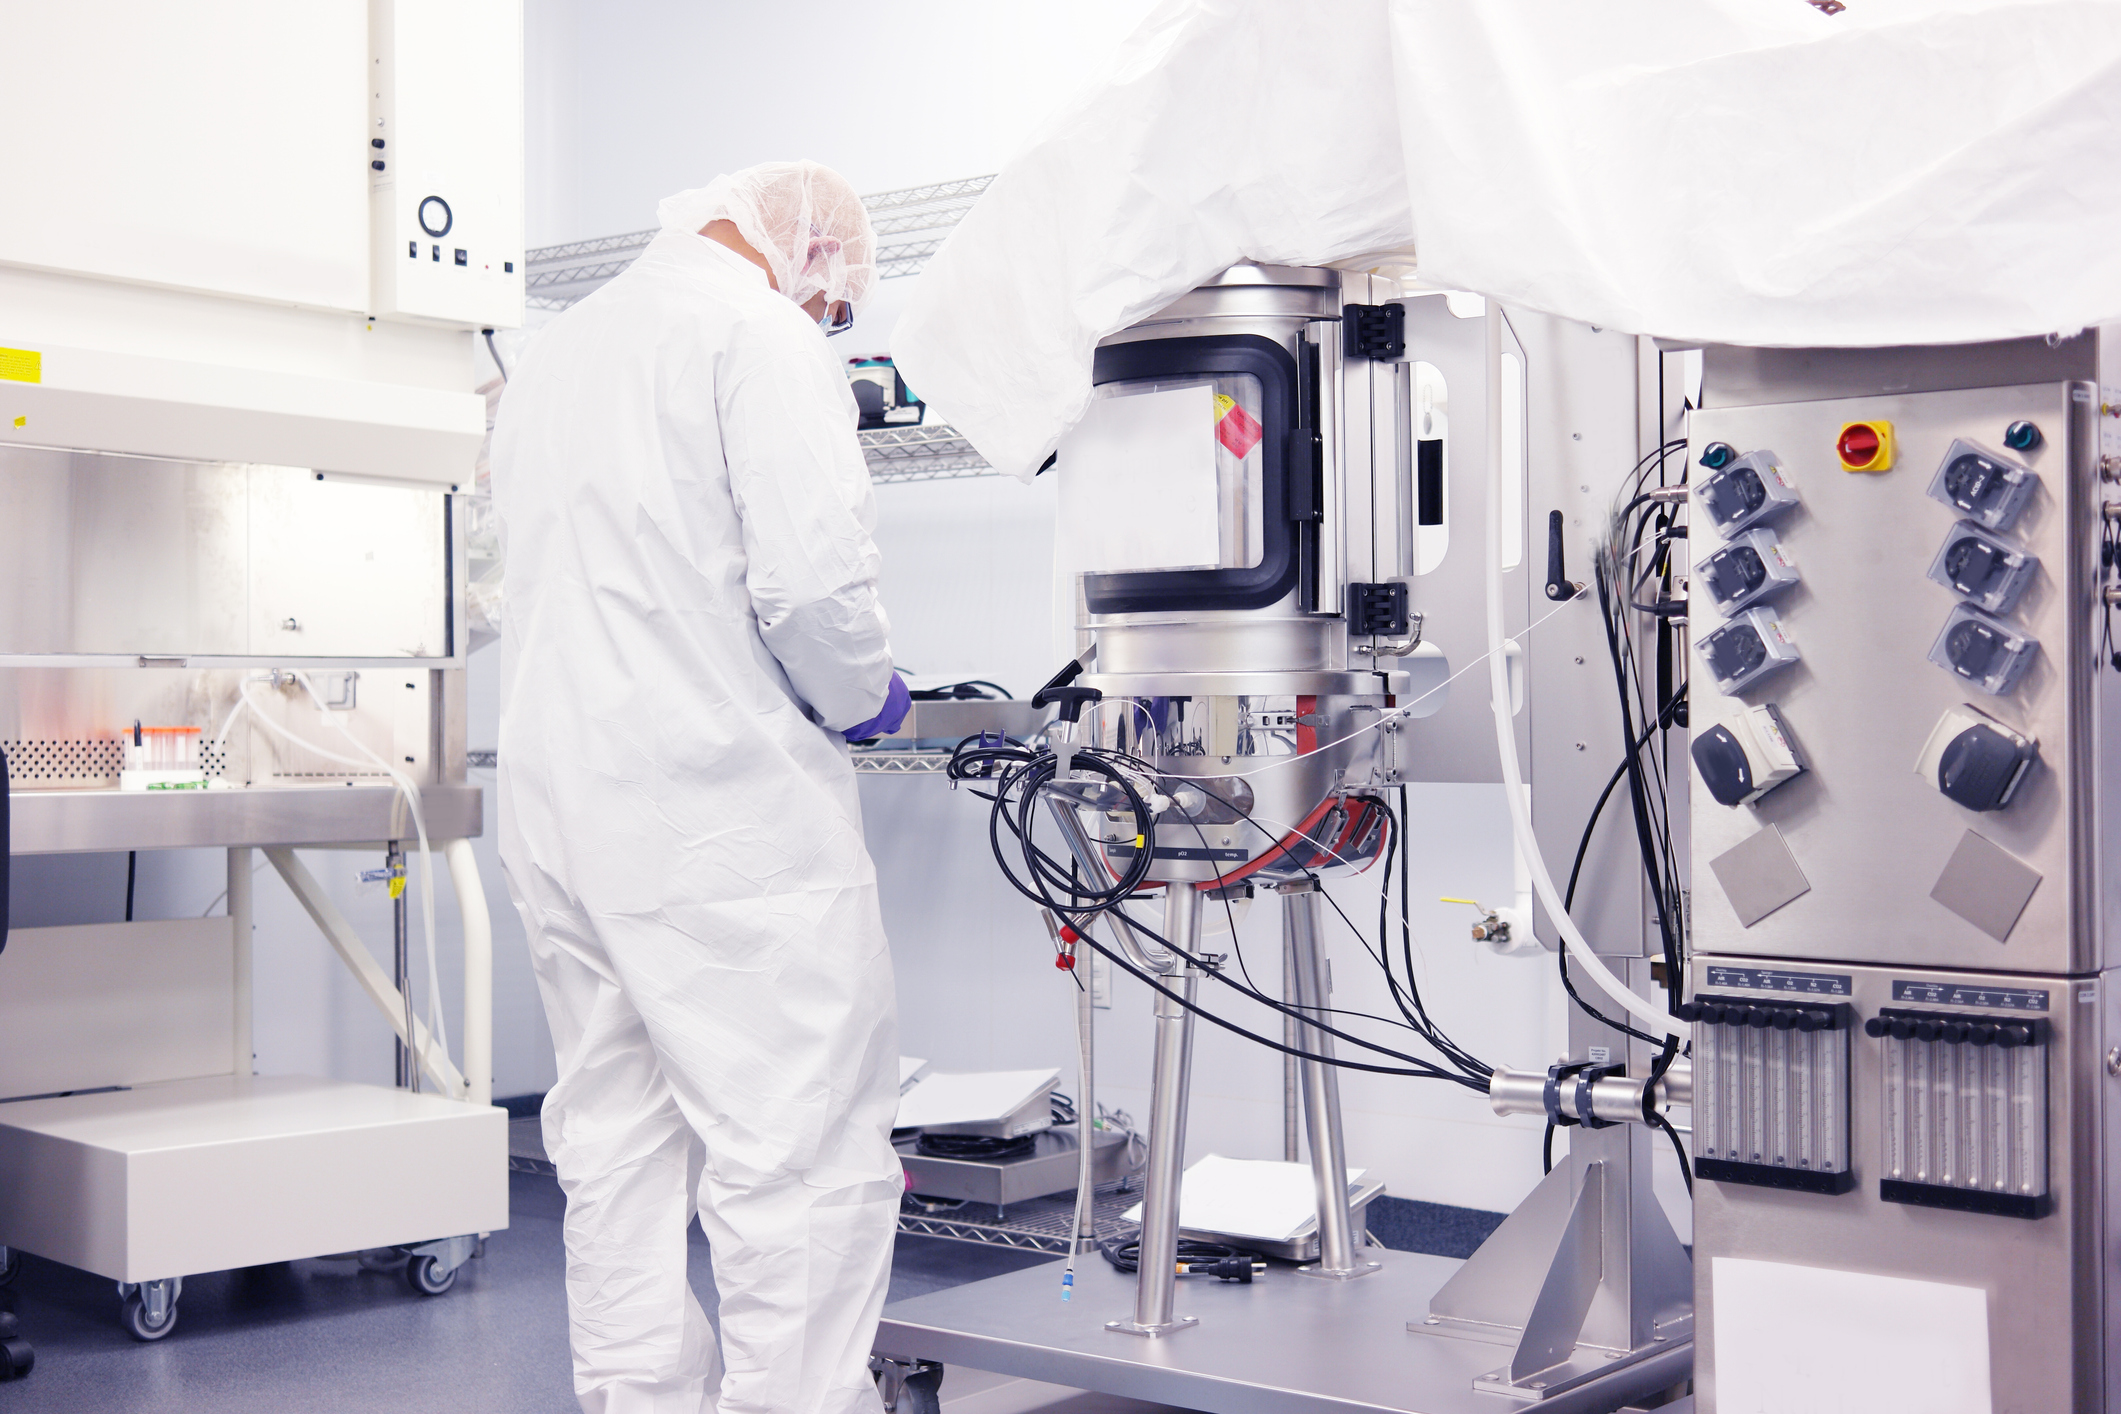 Choosing the Right Medical Grade Fiber Optic Cable Part 2: Pistoning